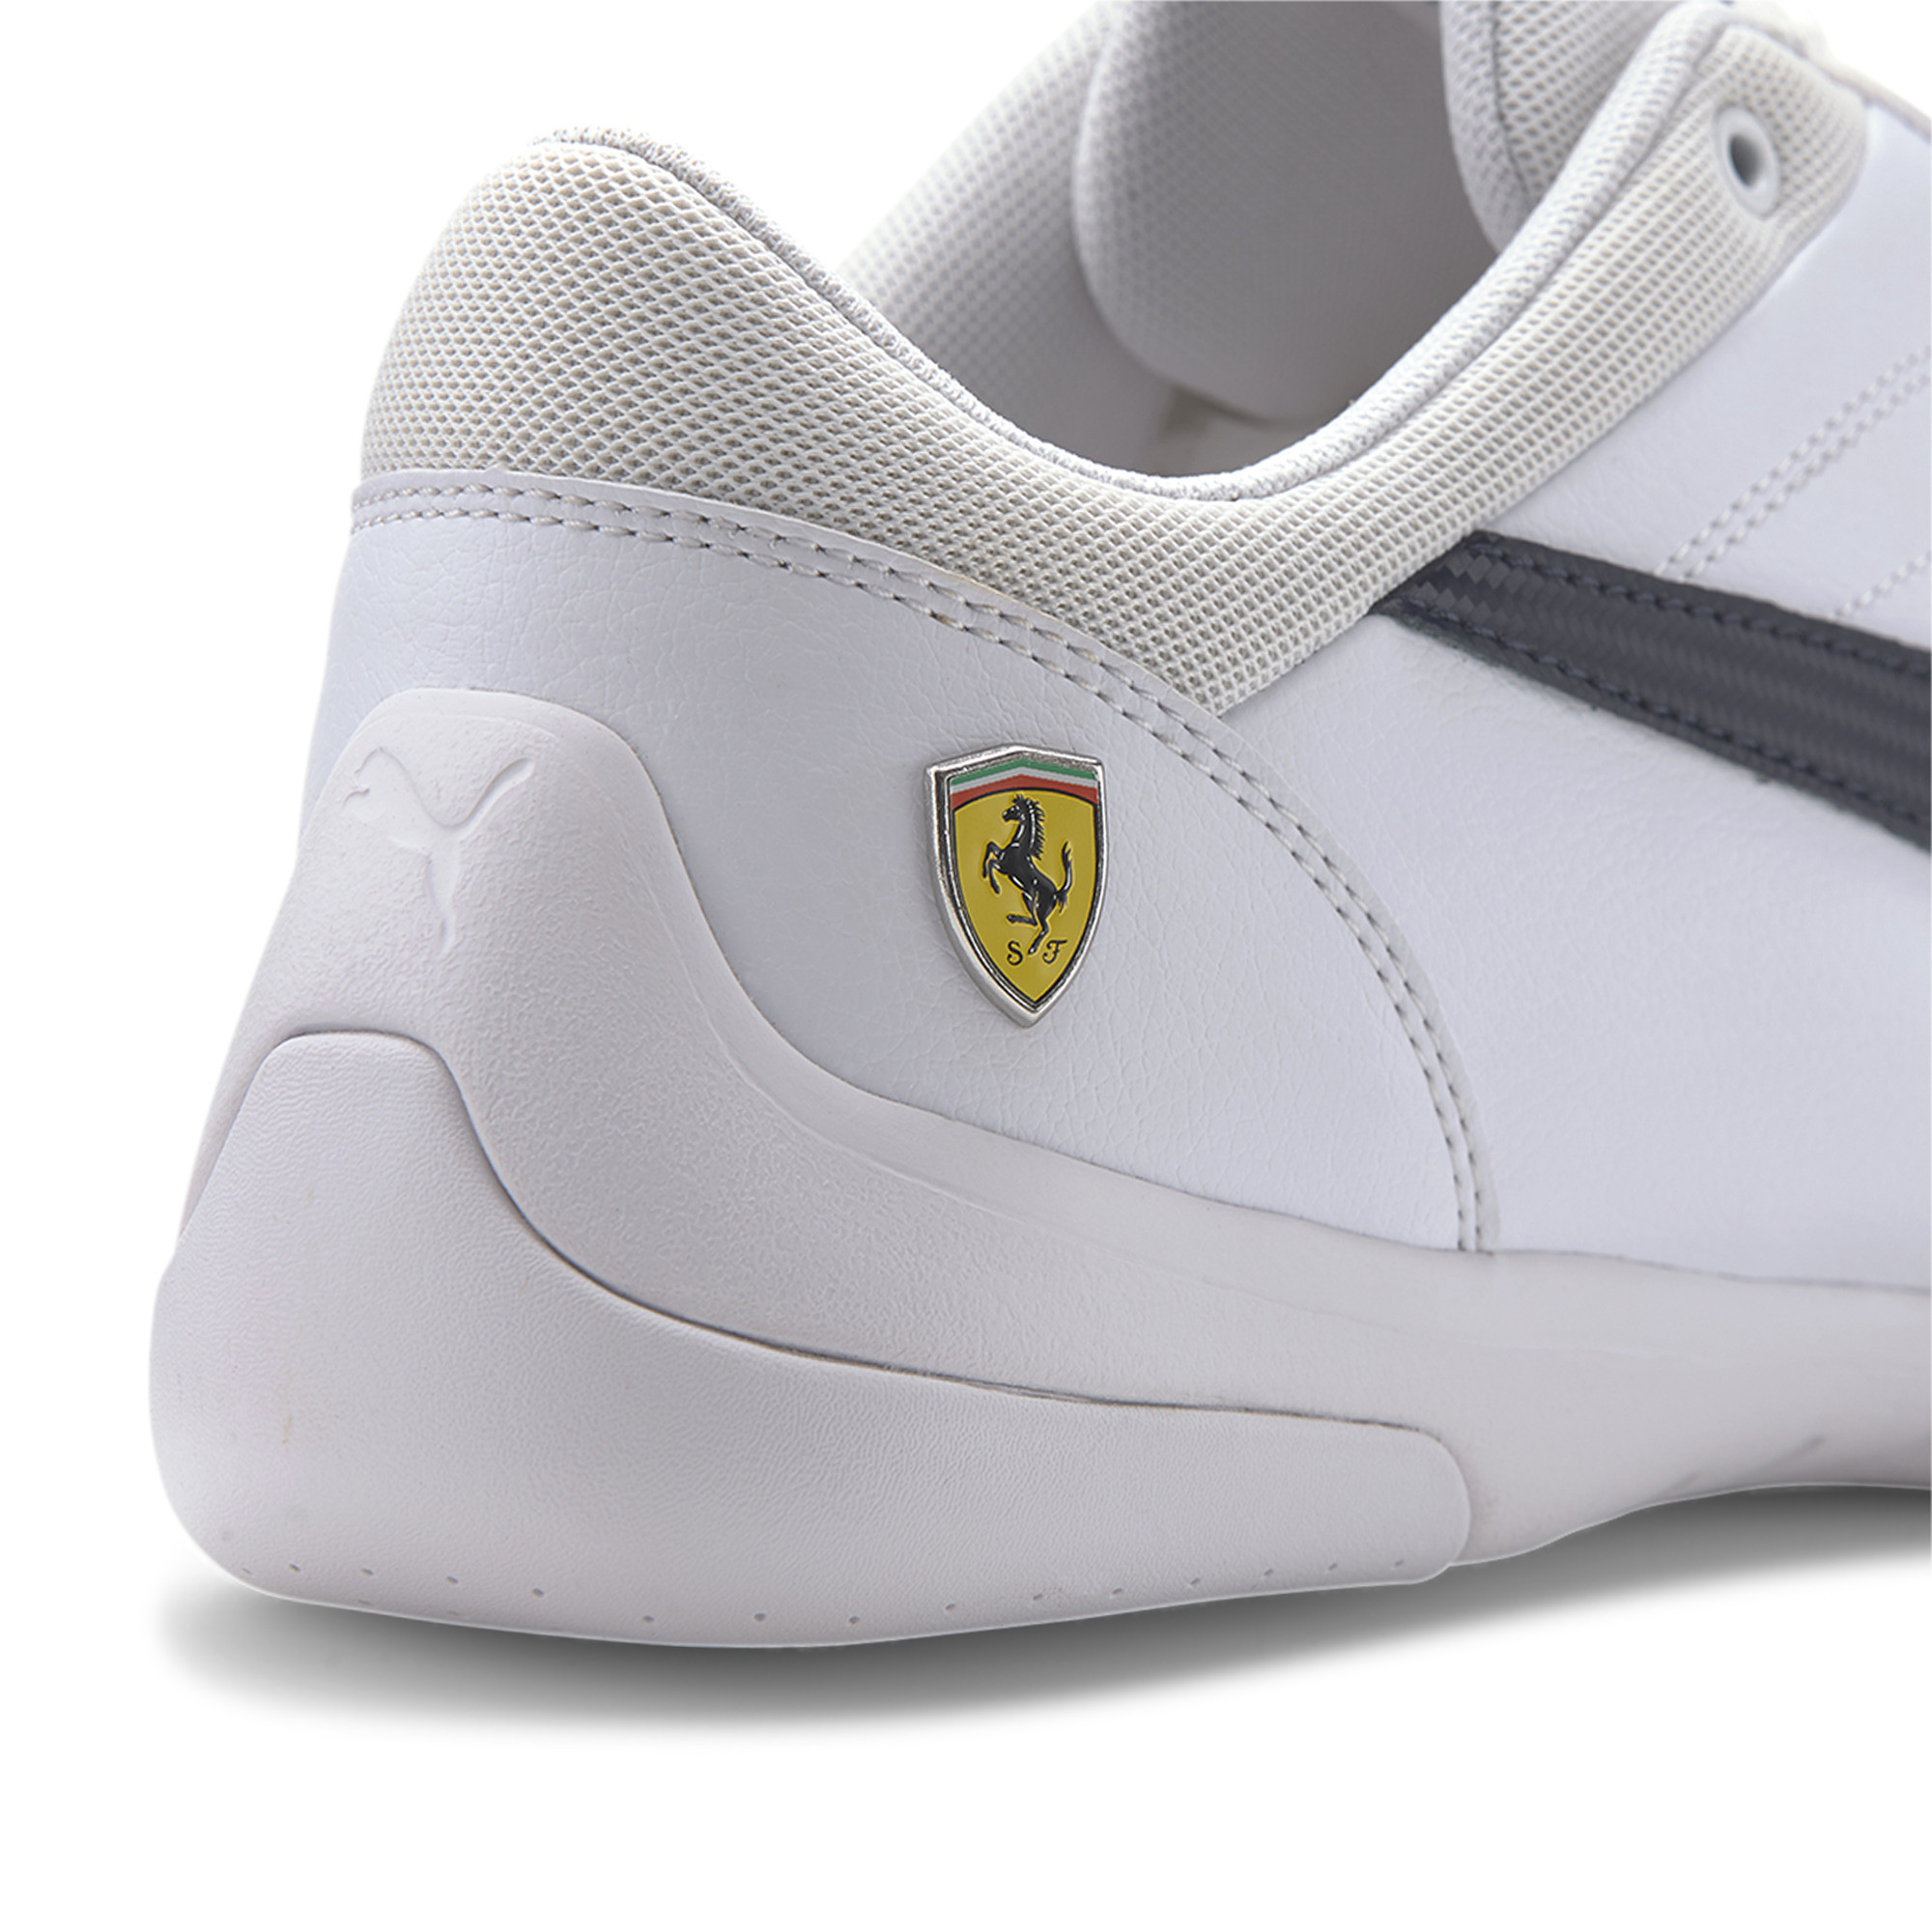 PUMA-Men-039-s-Scuderia-Ferrari-Kart-Cat-III-Motorsport-Shoes thumbnail 16